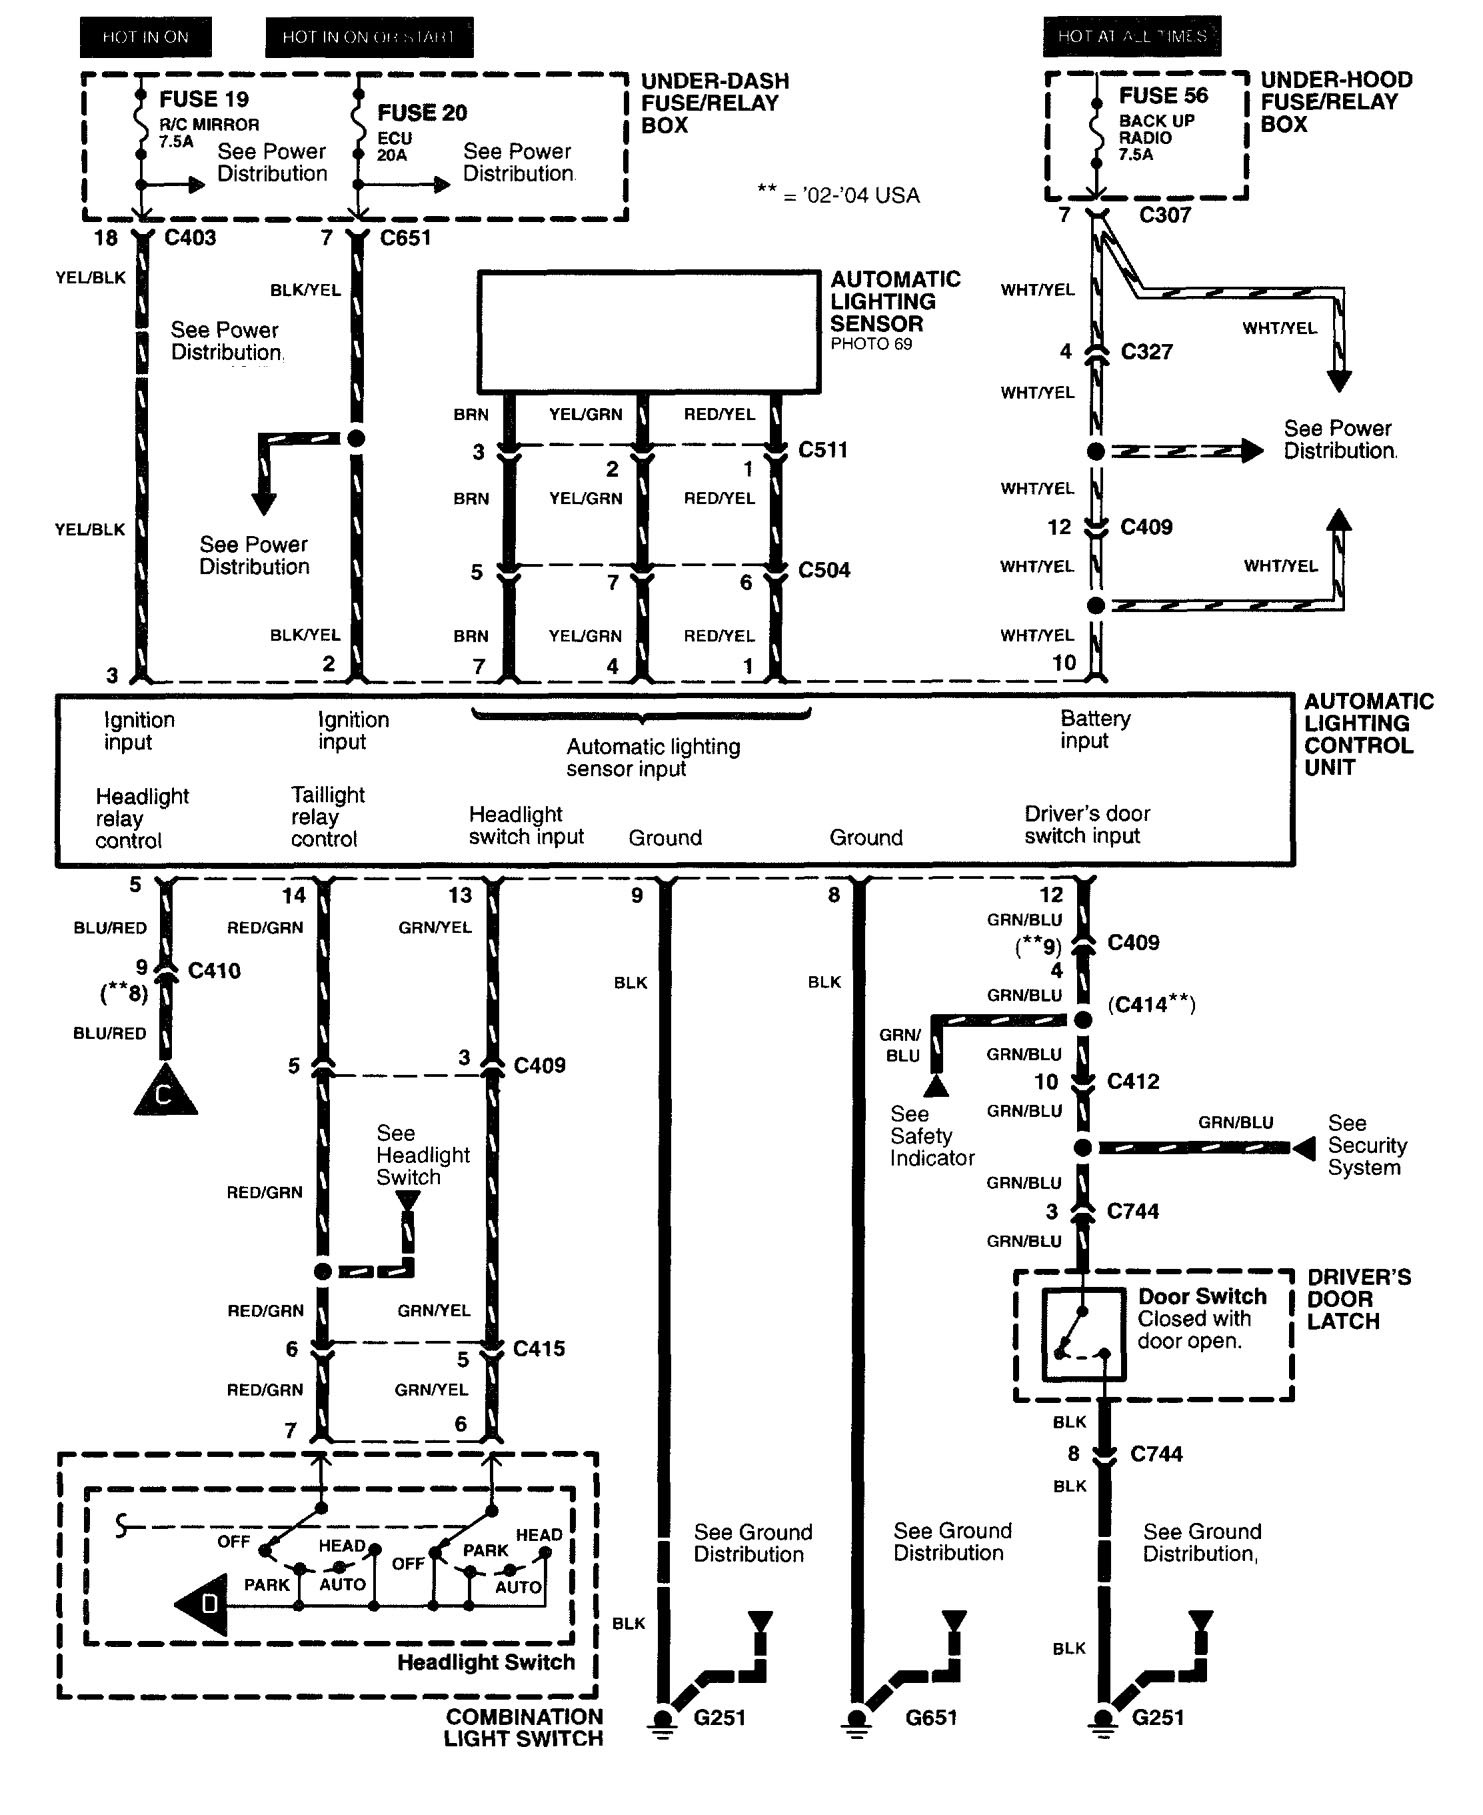 acura rl  2003 - 2004  - wiring diagrams